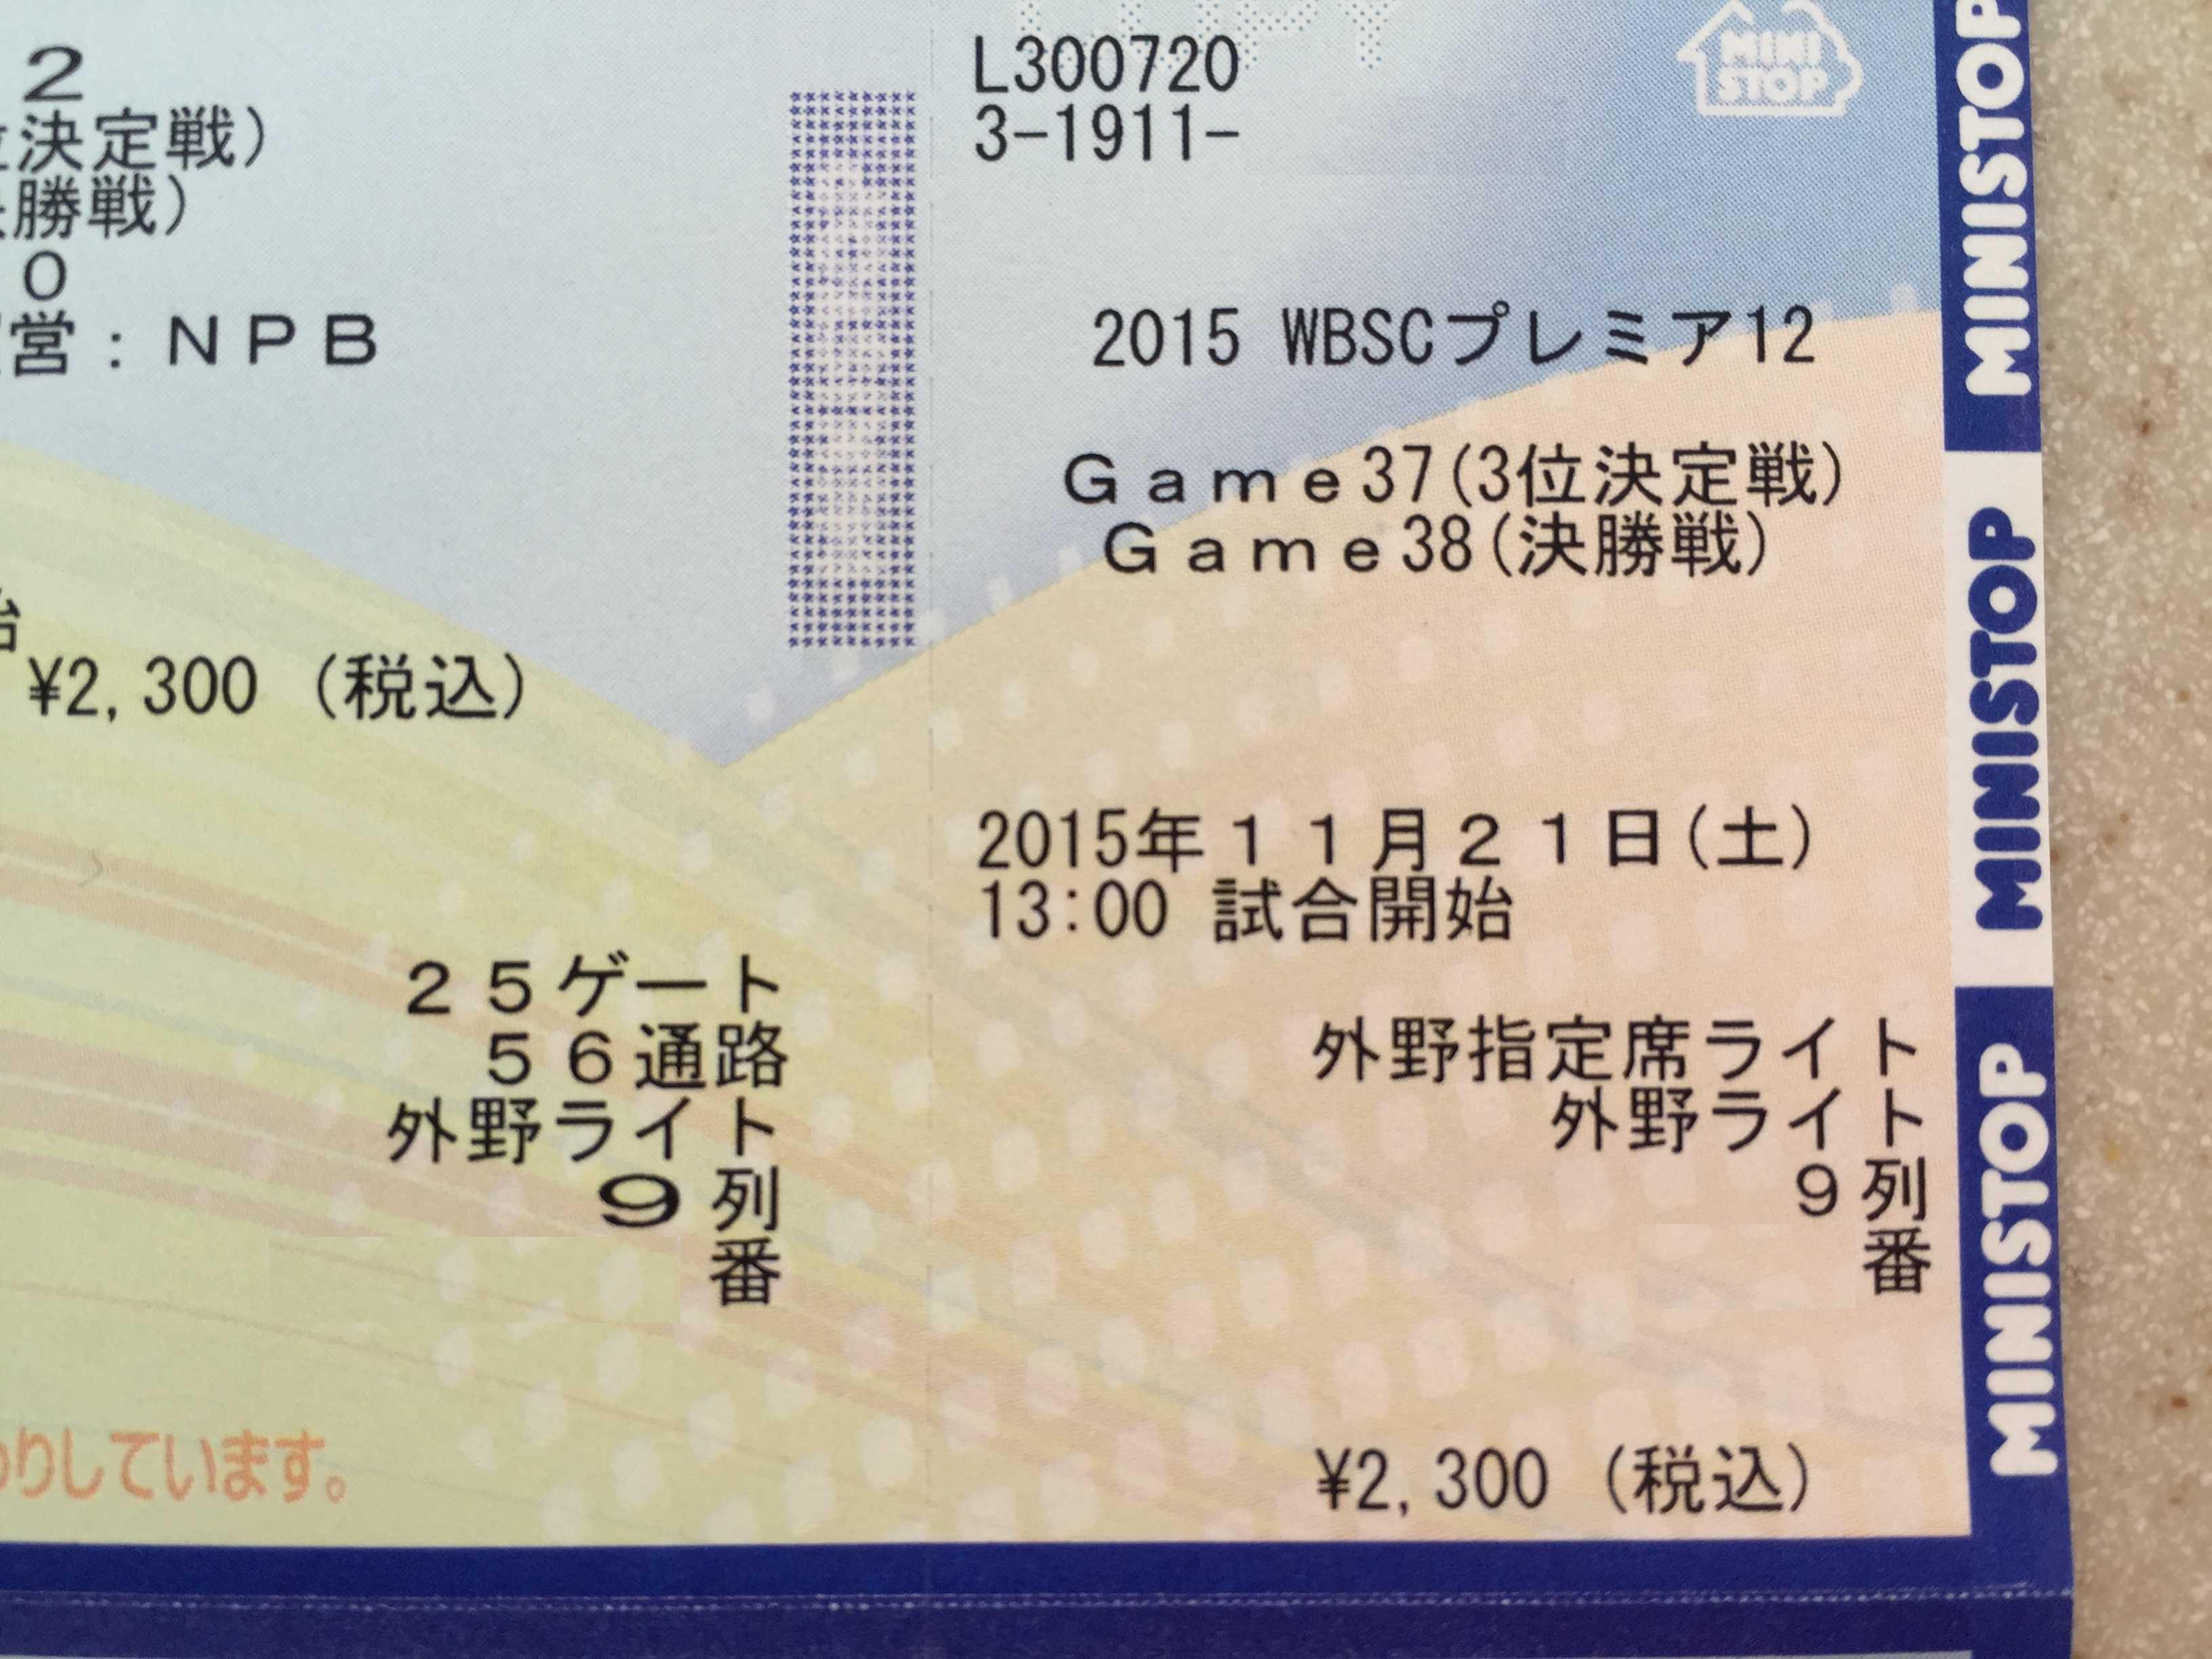 2015 WBSC プレミア12 チケット